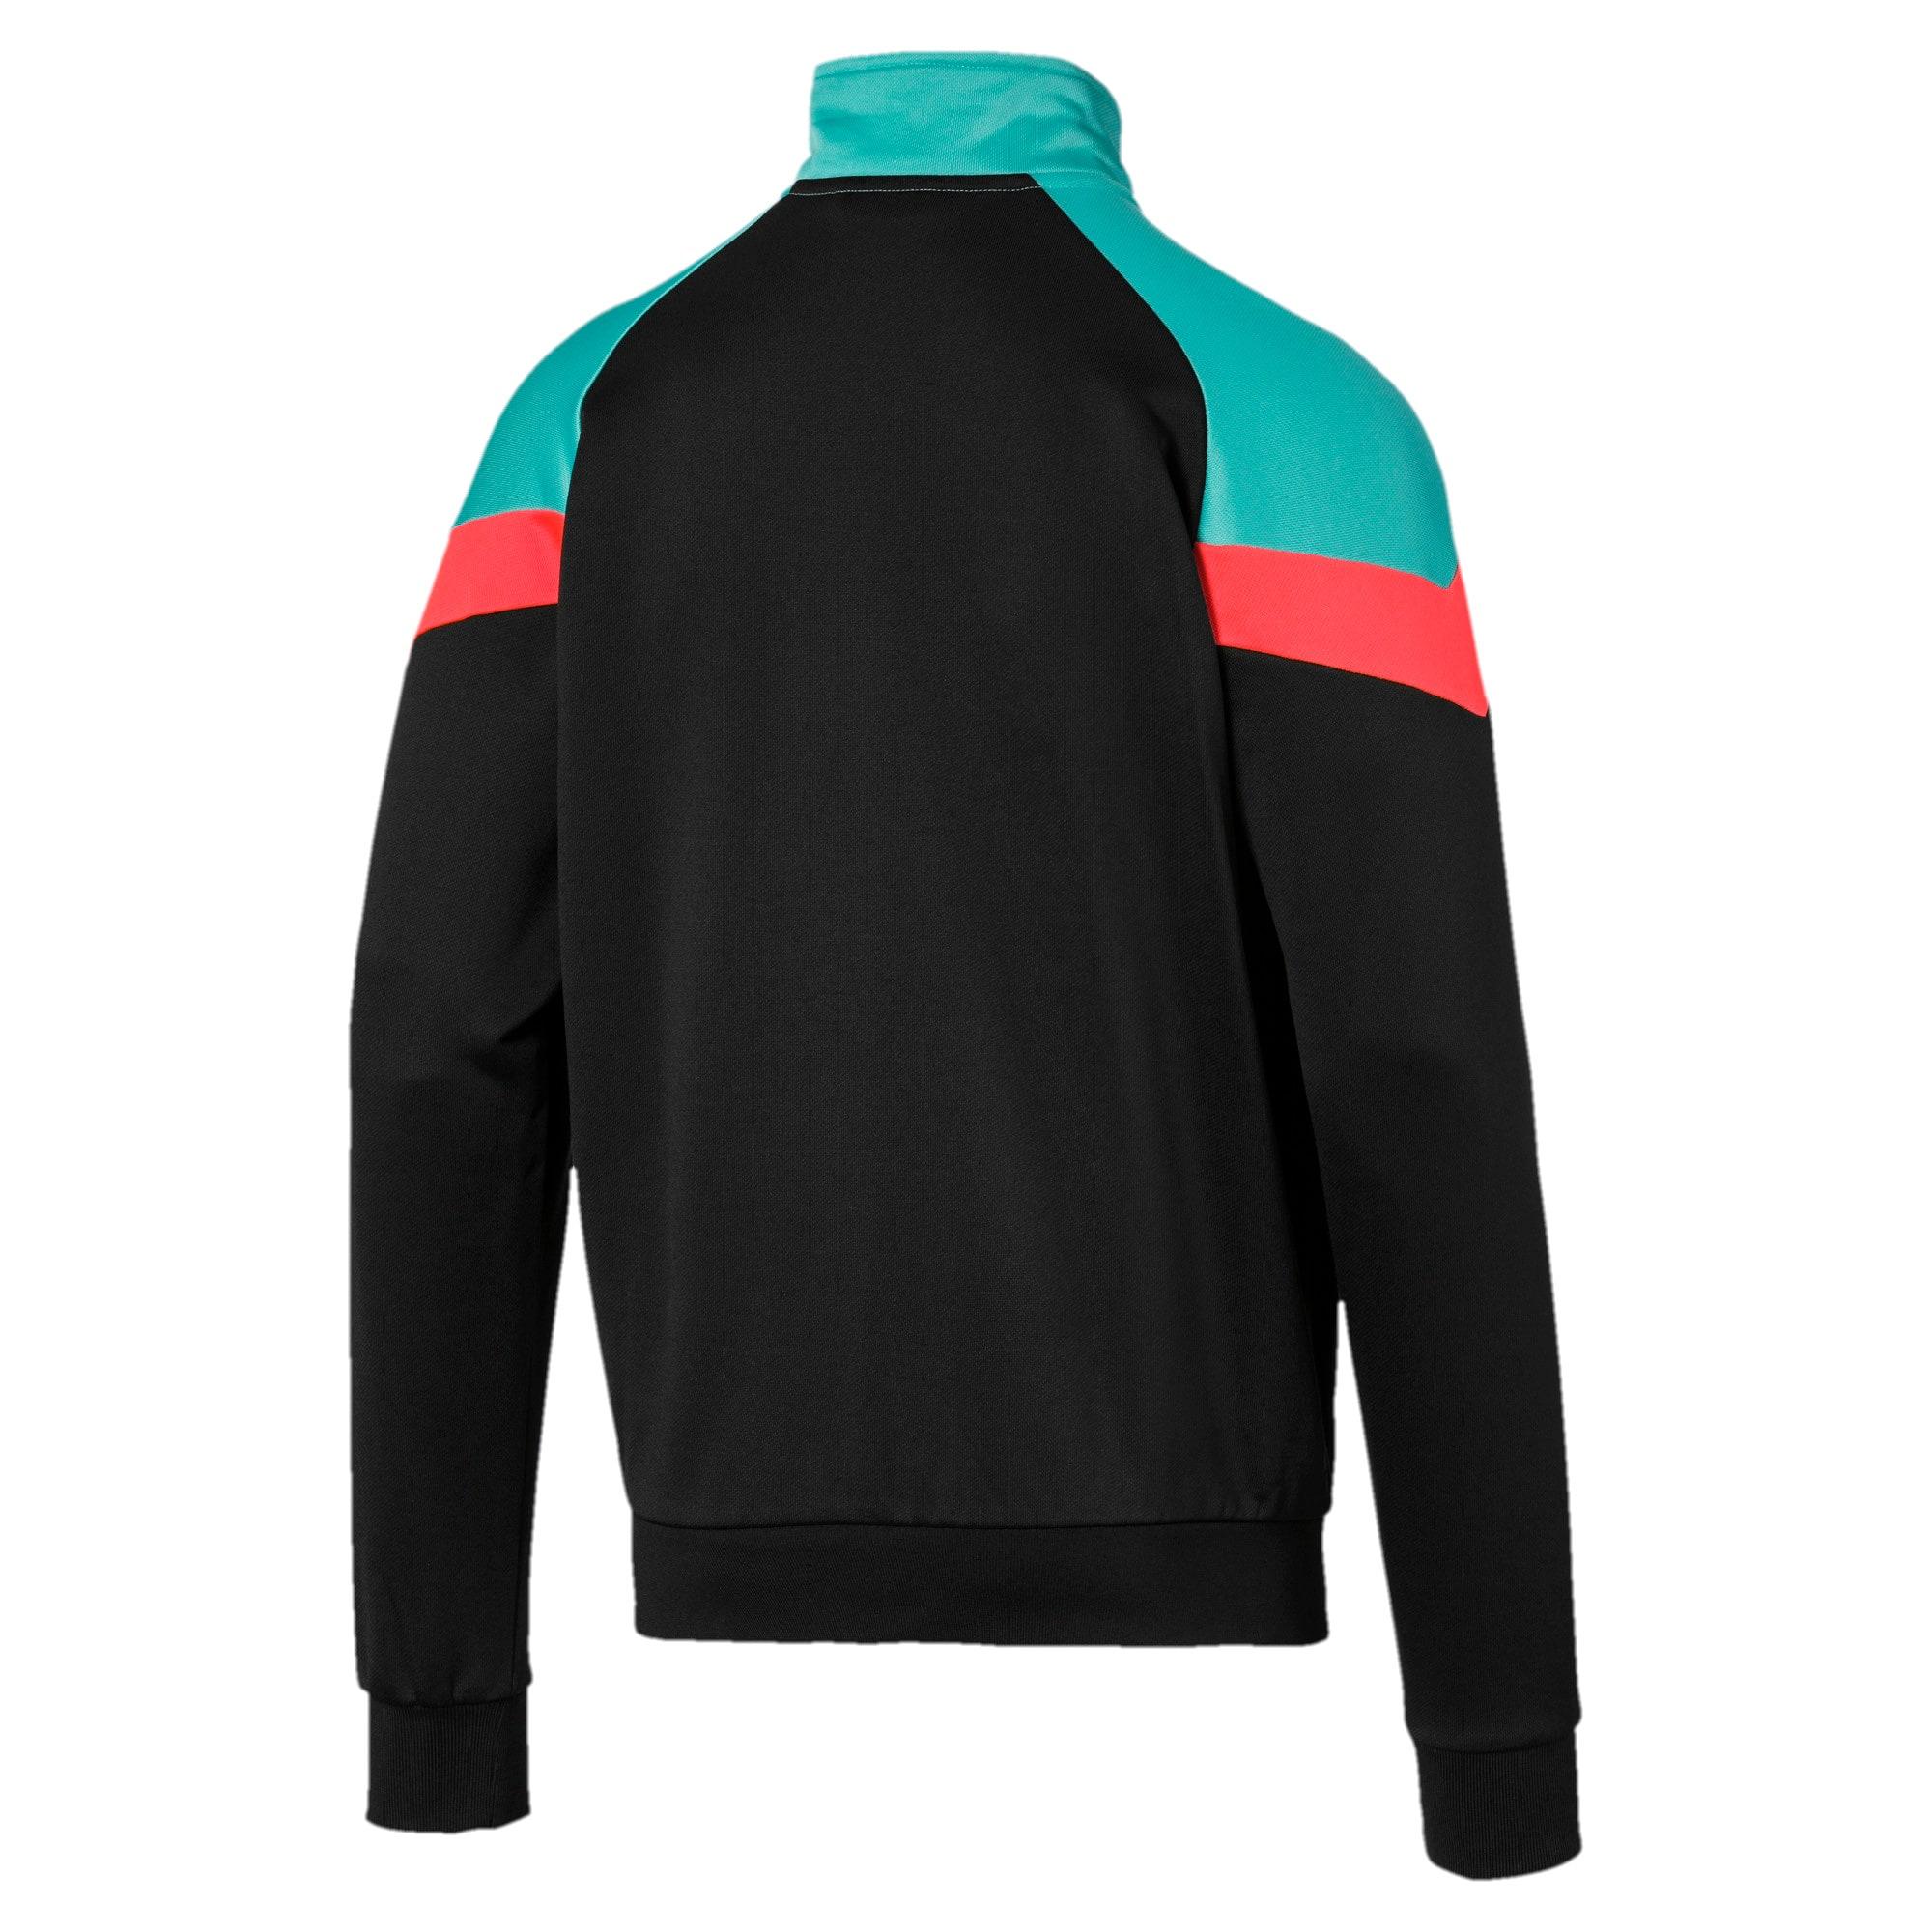 Thumbnail 5 of Iconic MCS Men's Track Jacket, Puma Black, medium